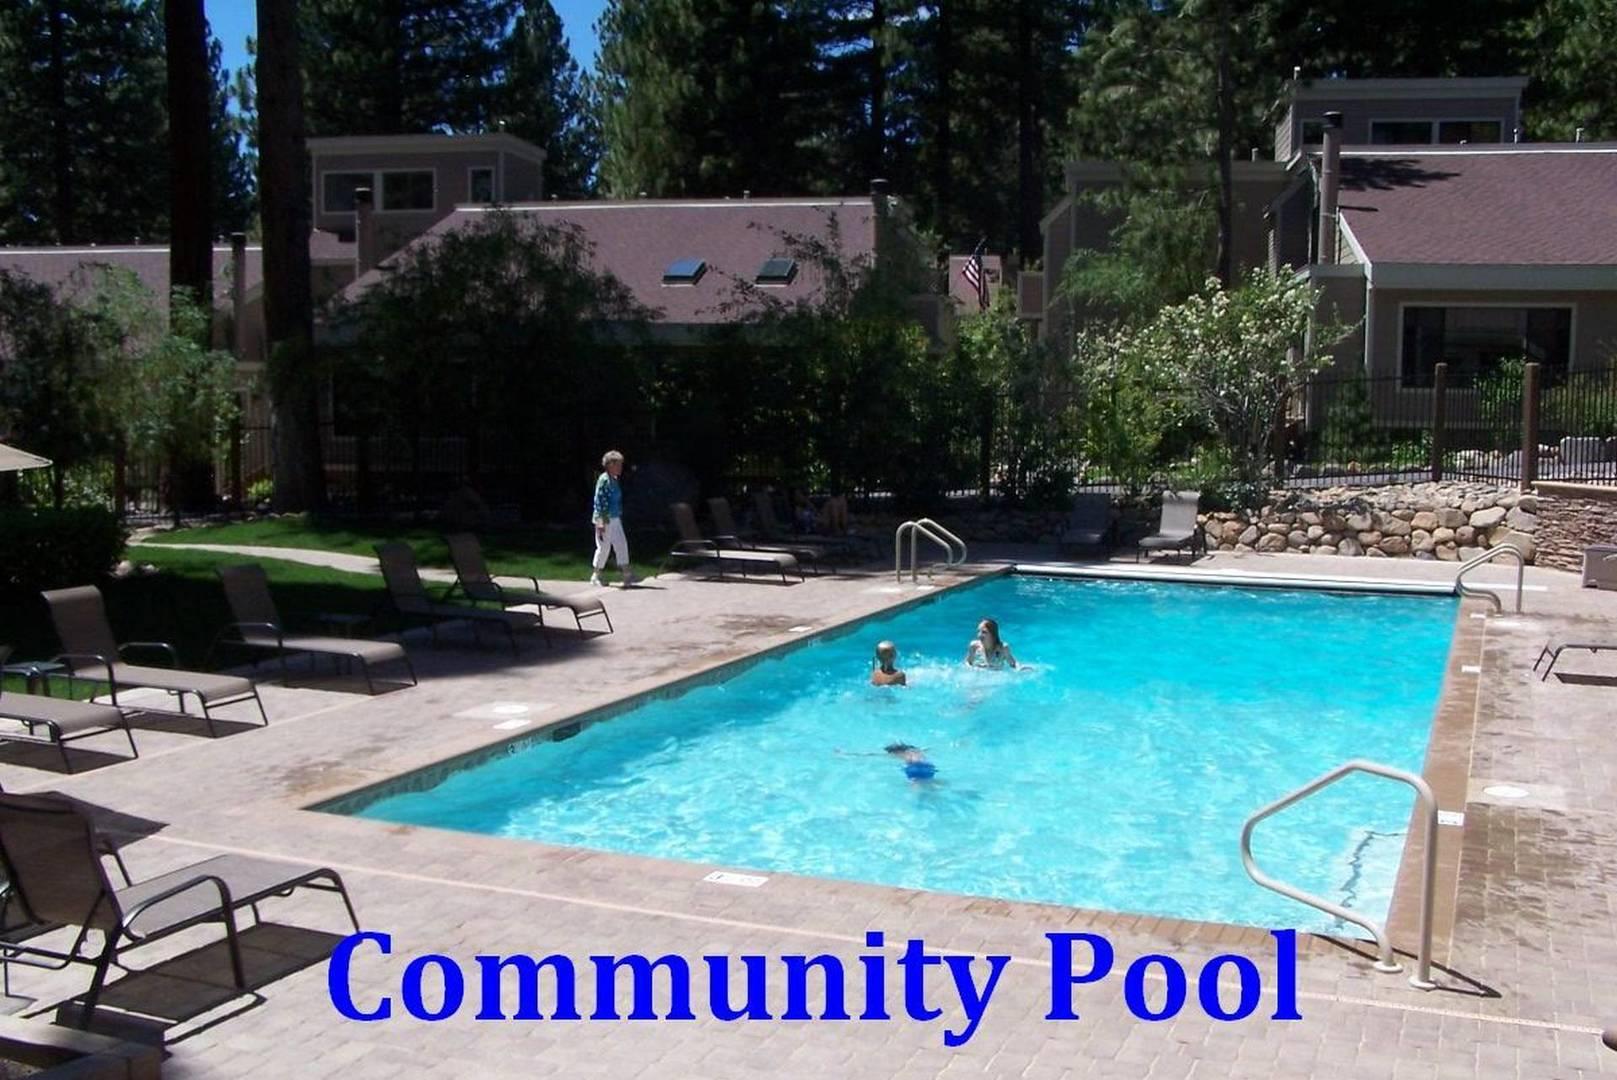 fpc0640 community pool